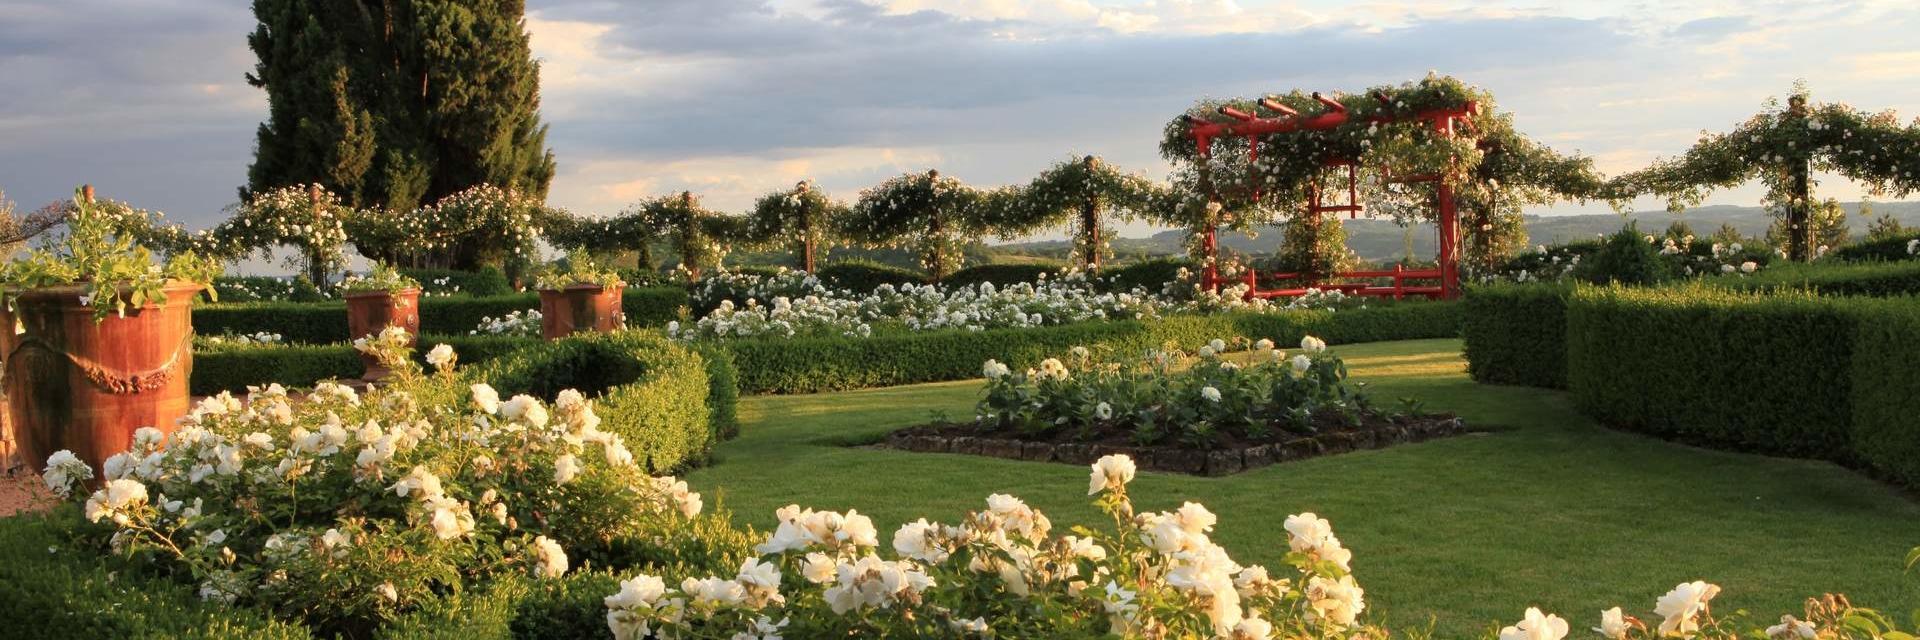 jardin blanc deyrignac georges lvque - Jardin D Eyrignac